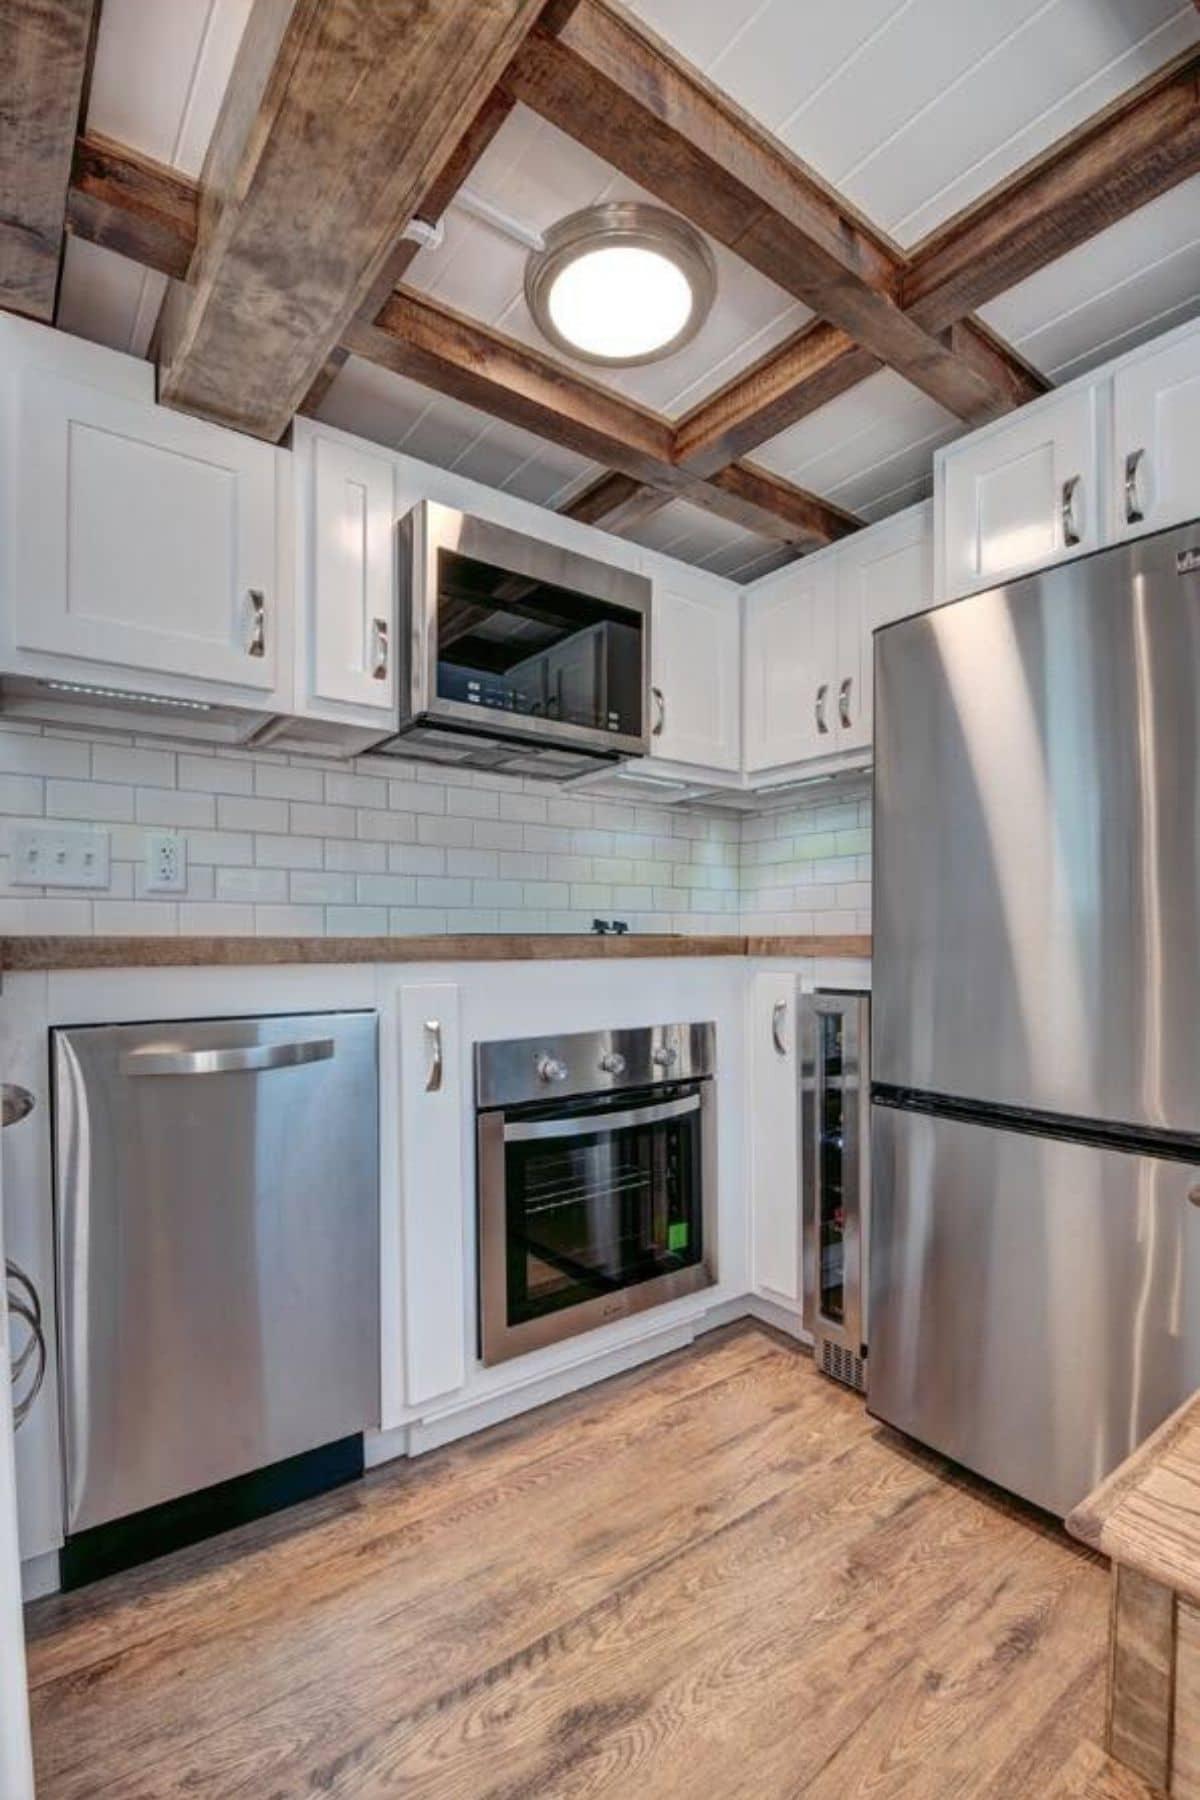 Kitchen with white cabinets dishwasher oven wine fridge and refrigerator